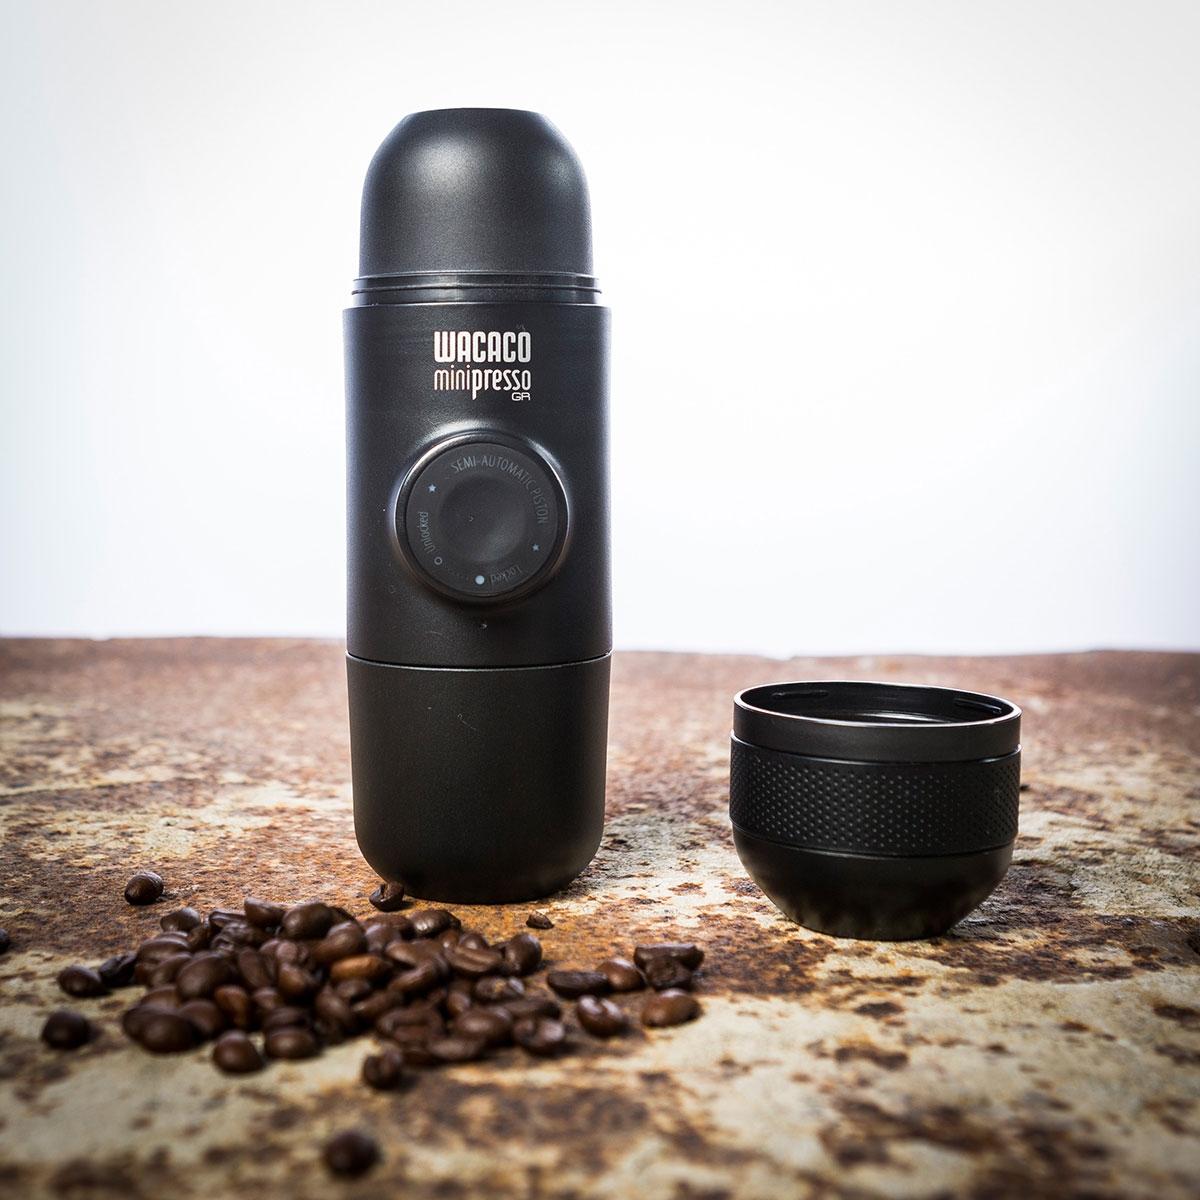 Minipresso Die kompakteste Espressomaschine der Welt Gemahlener Kaffee